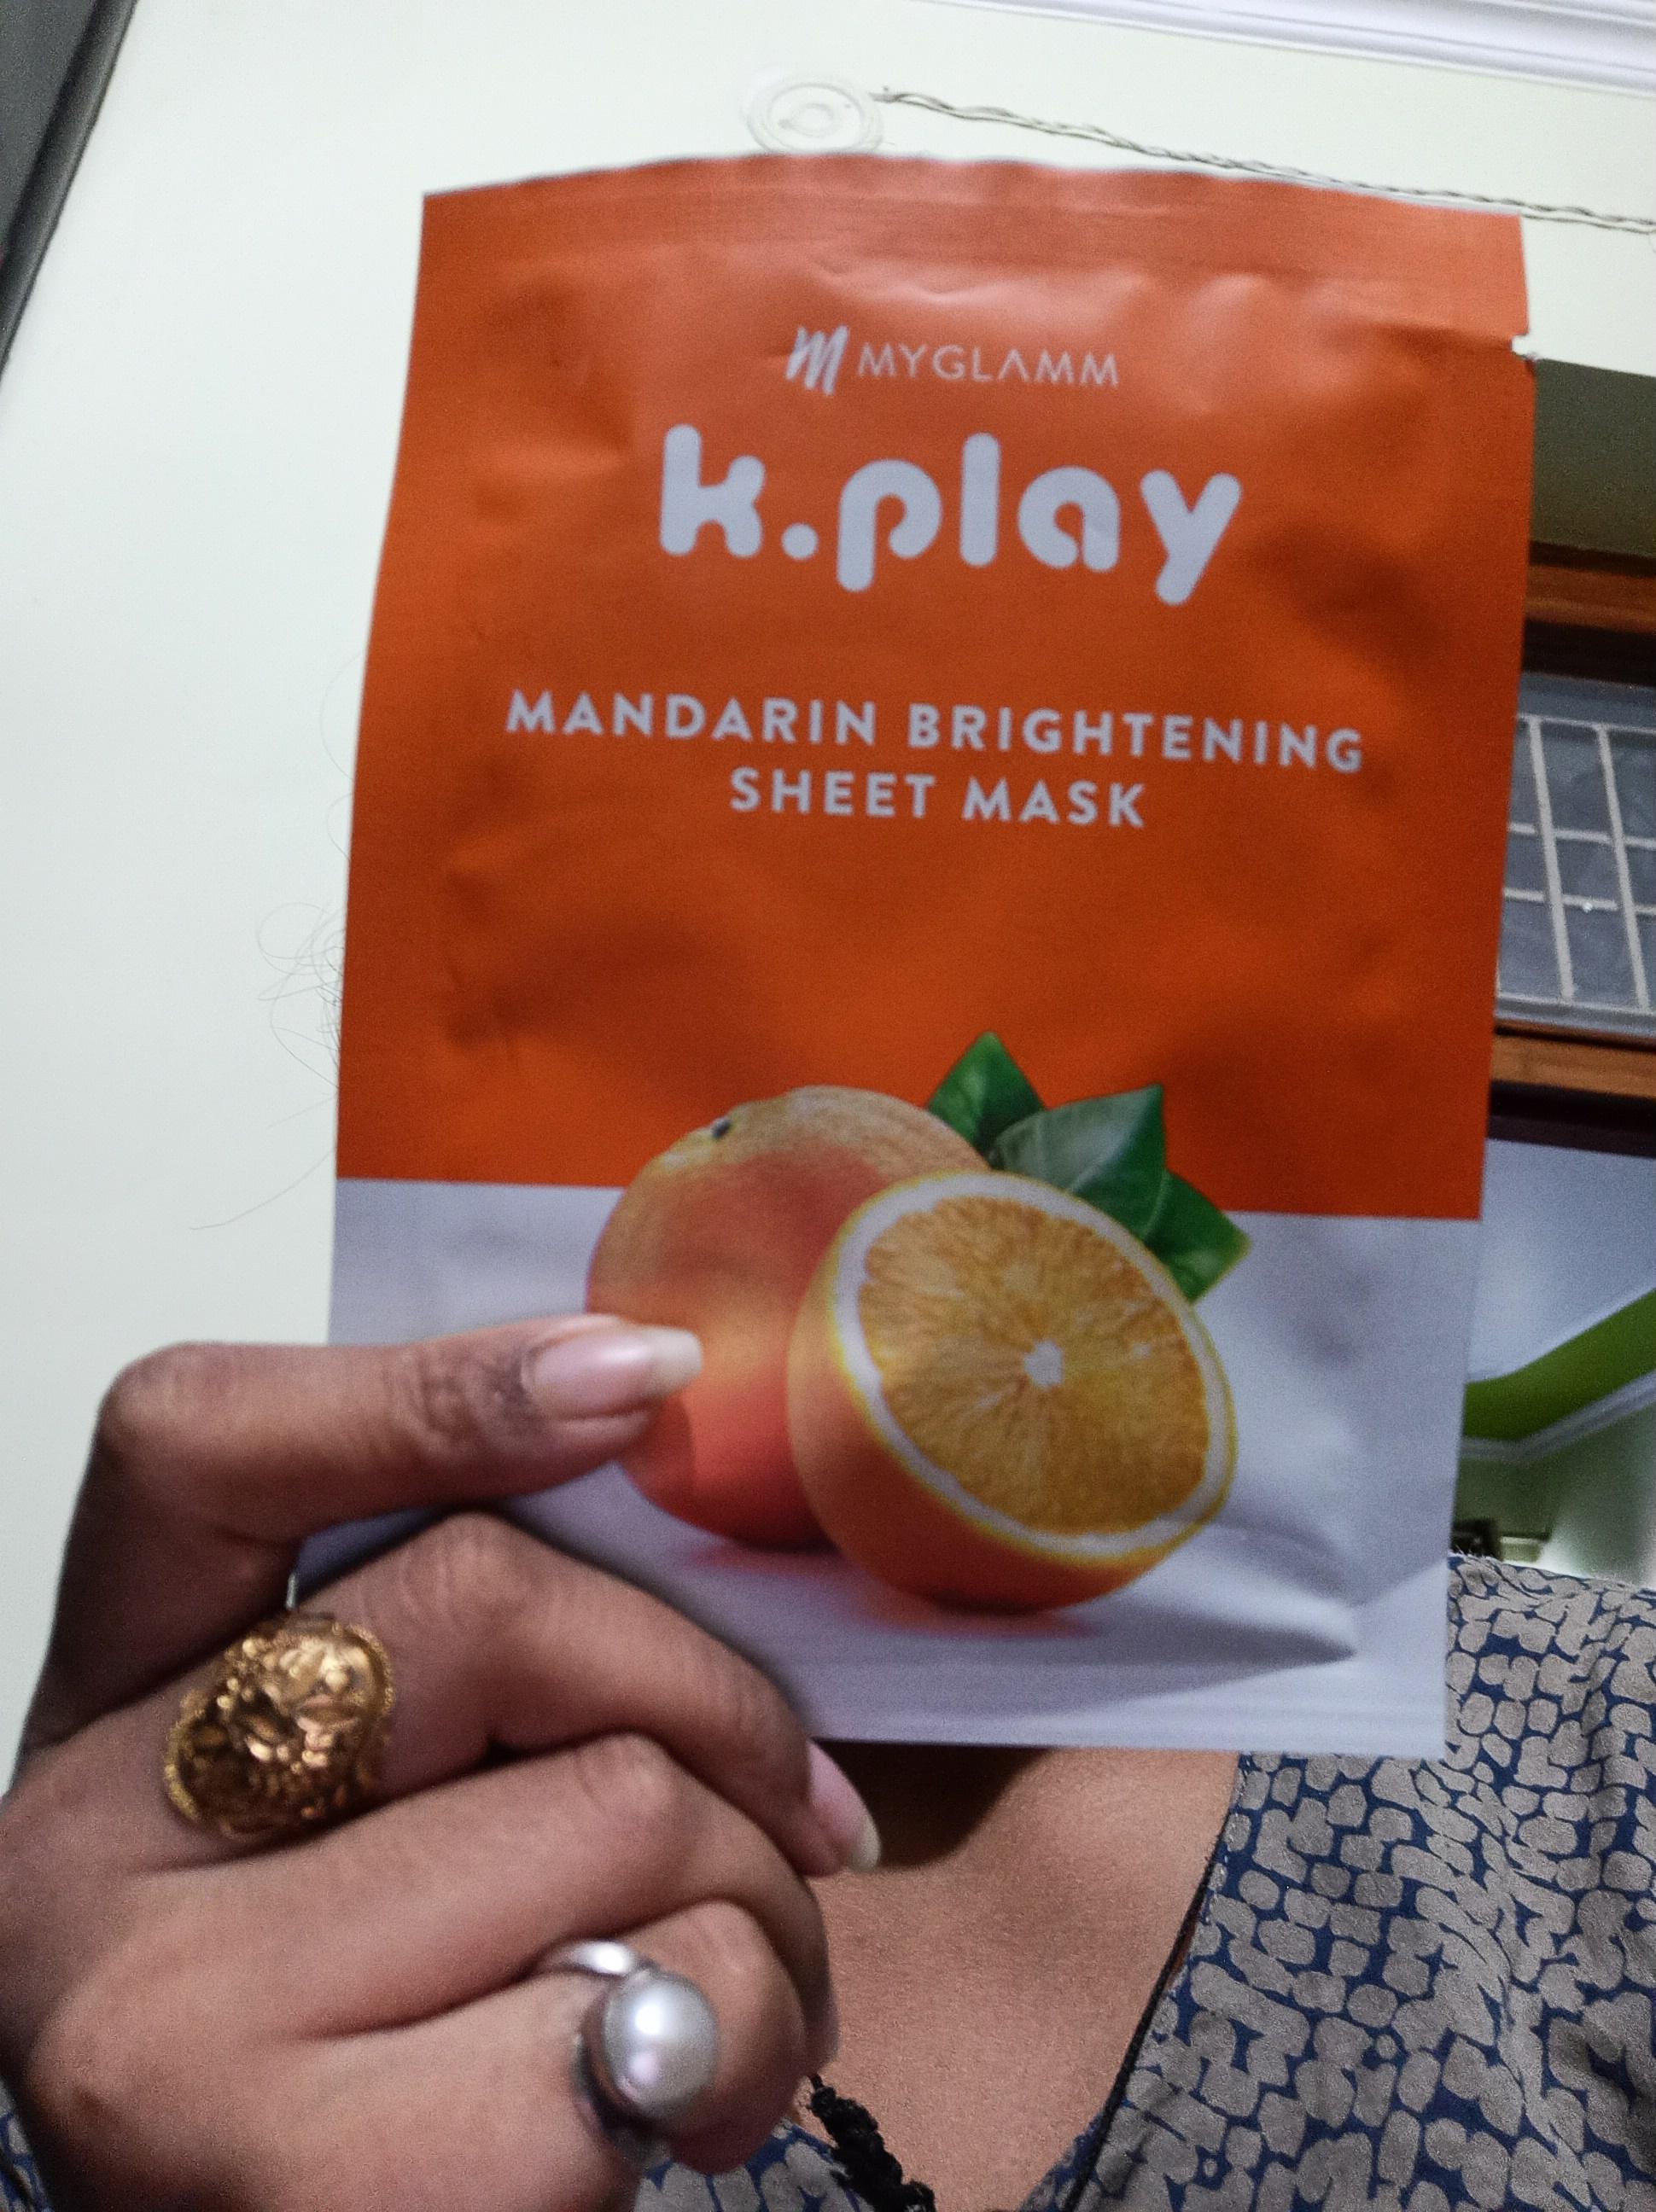 MyGlamm K.Play Mandarin Brightening Sheet Mask-Great product-By kanu4